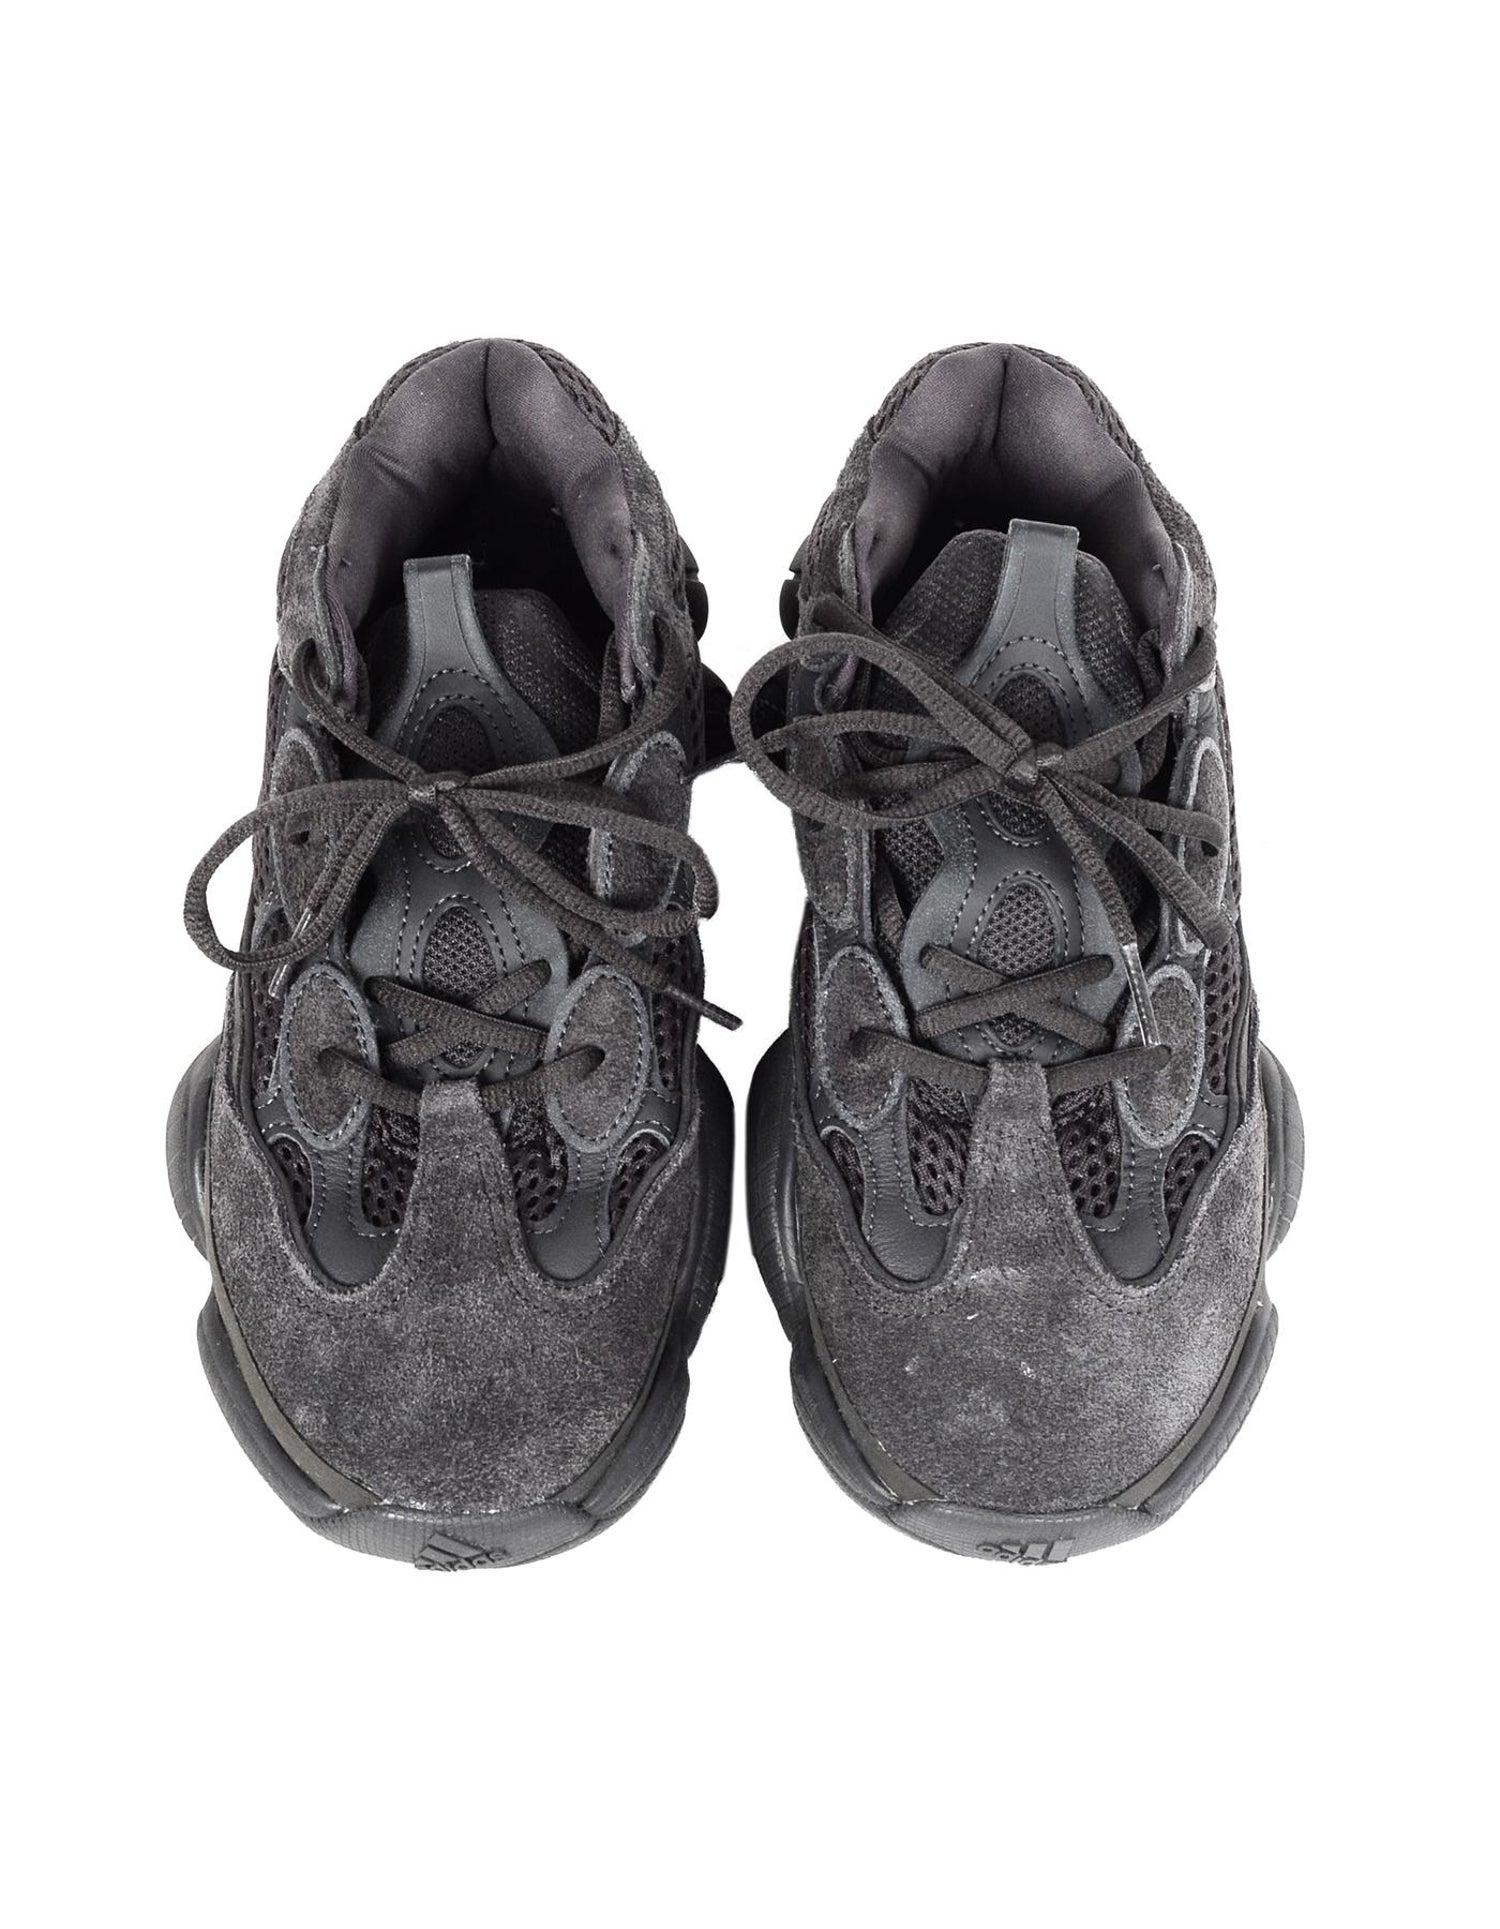 3b8432ef9 Adidas x Yeezy Unisex 2018 500 Desert Rat Utility Black Sneakers Sz ...